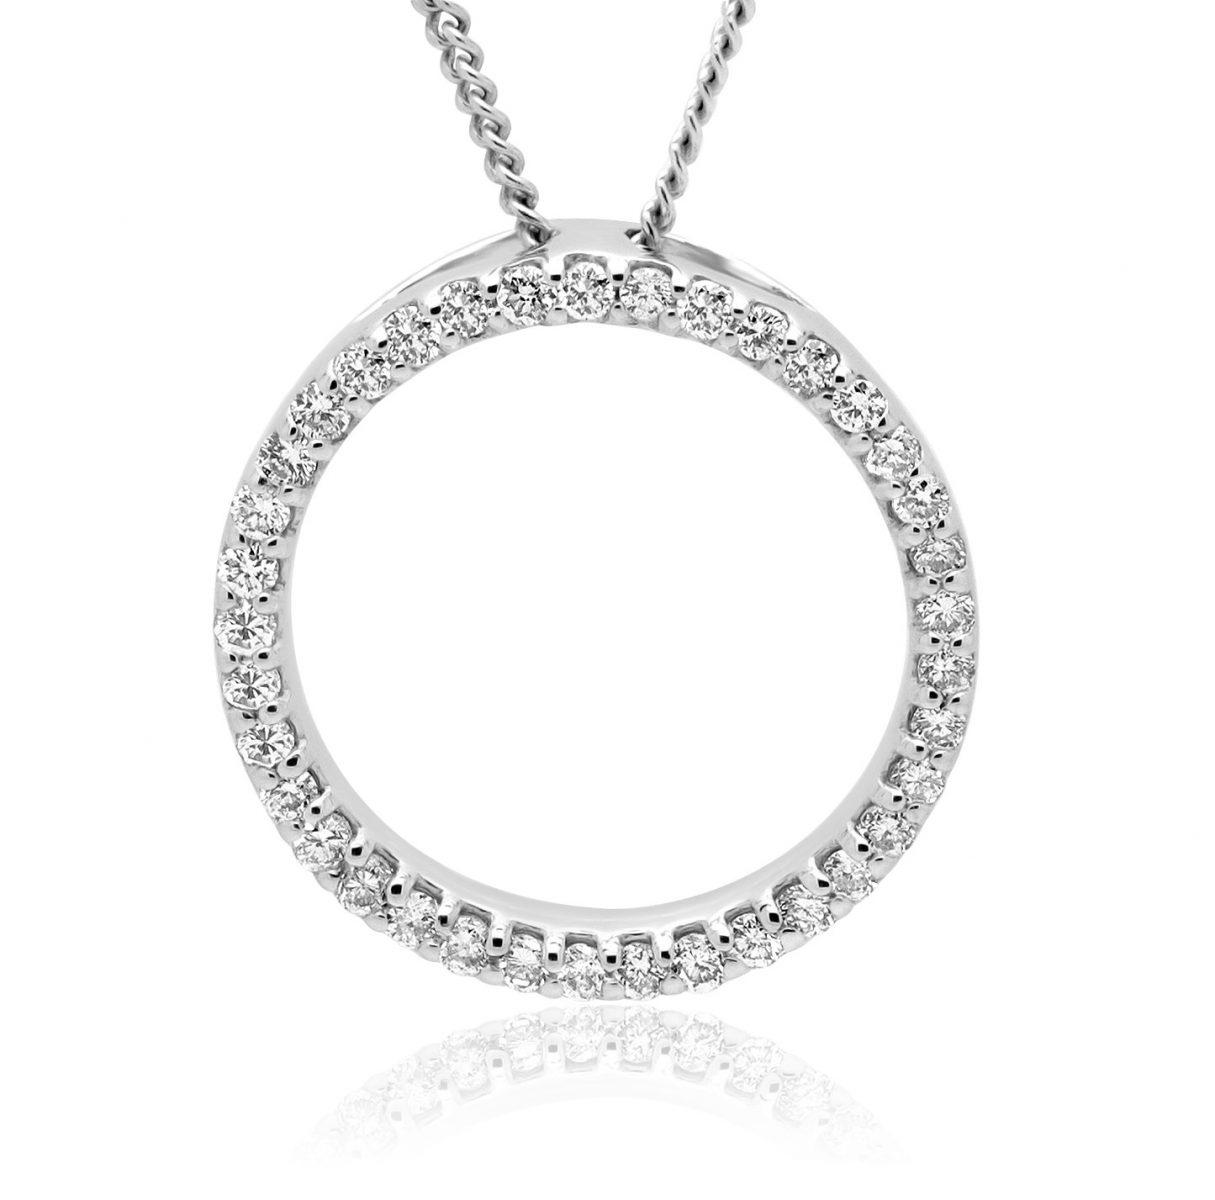 diamond pendant necklace circle of life style 14k white. Black Bedroom Furniture Sets. Home Design Ideas